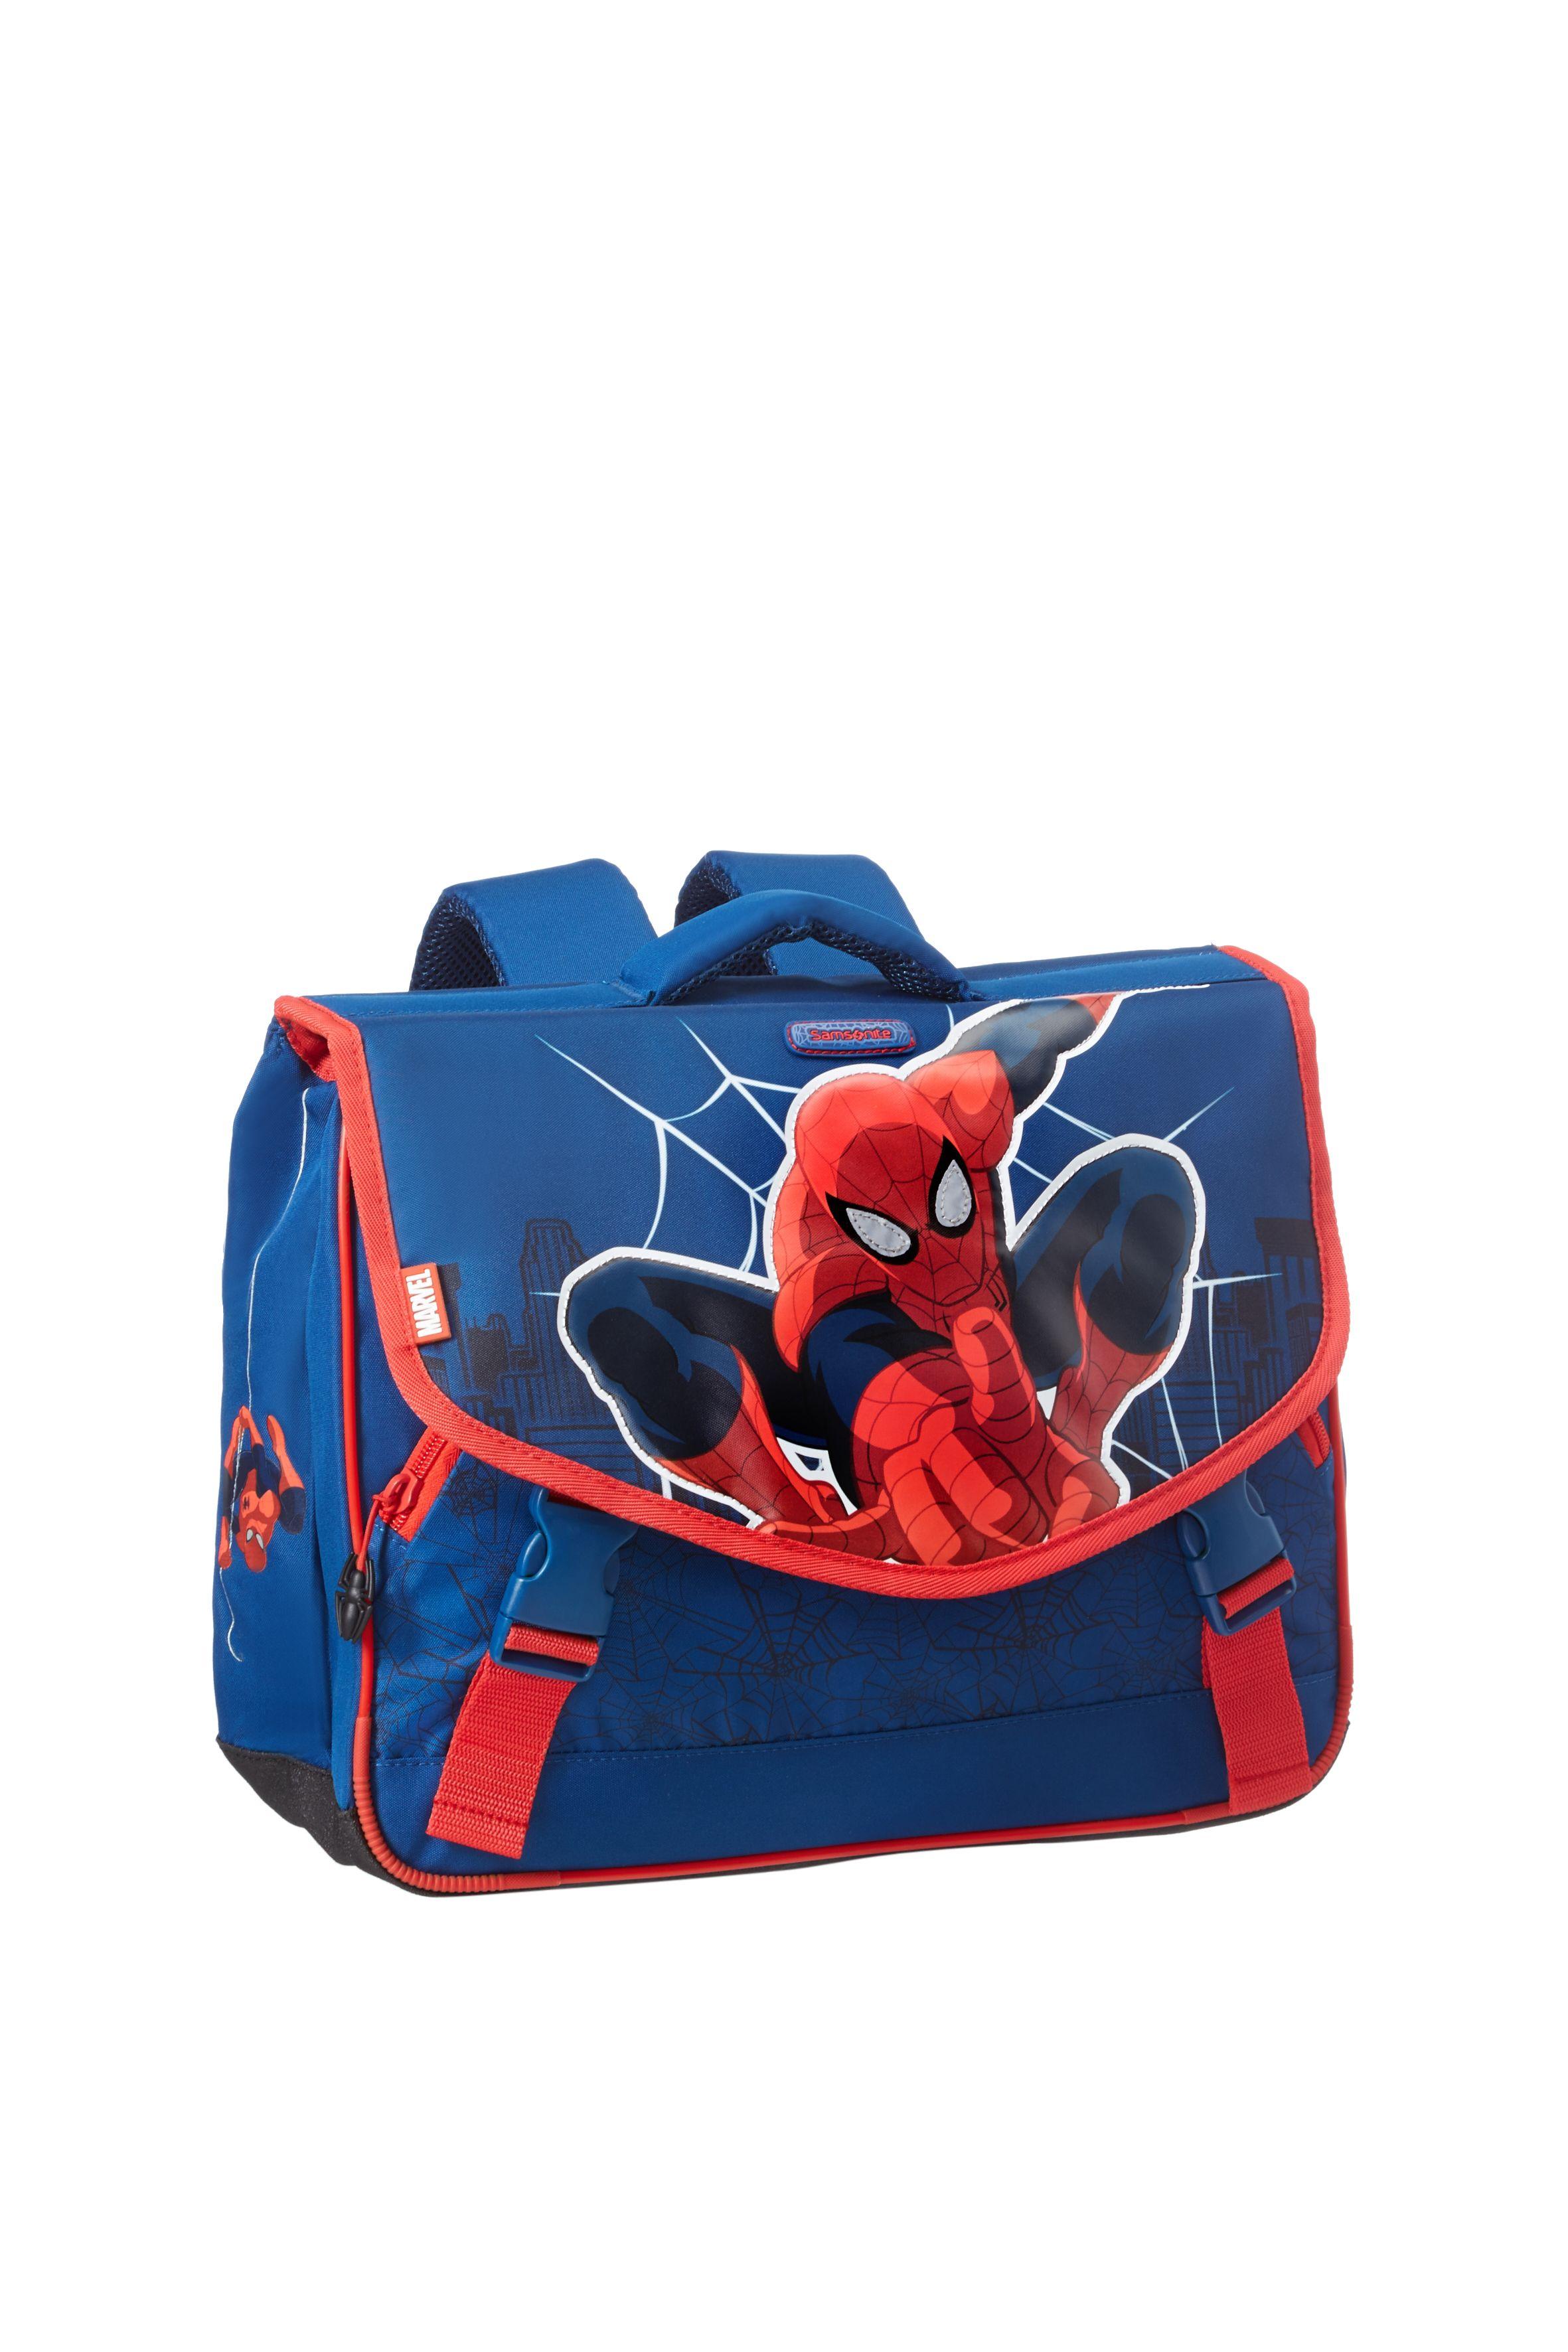 0ddfaae27b Marvel Wonder - Spider-Man Schoolbag  Disney  Samsonite  Marvel  SpiderMan   Travel  Kids  School  Schoolbag  MySamsonite  ByYourSide